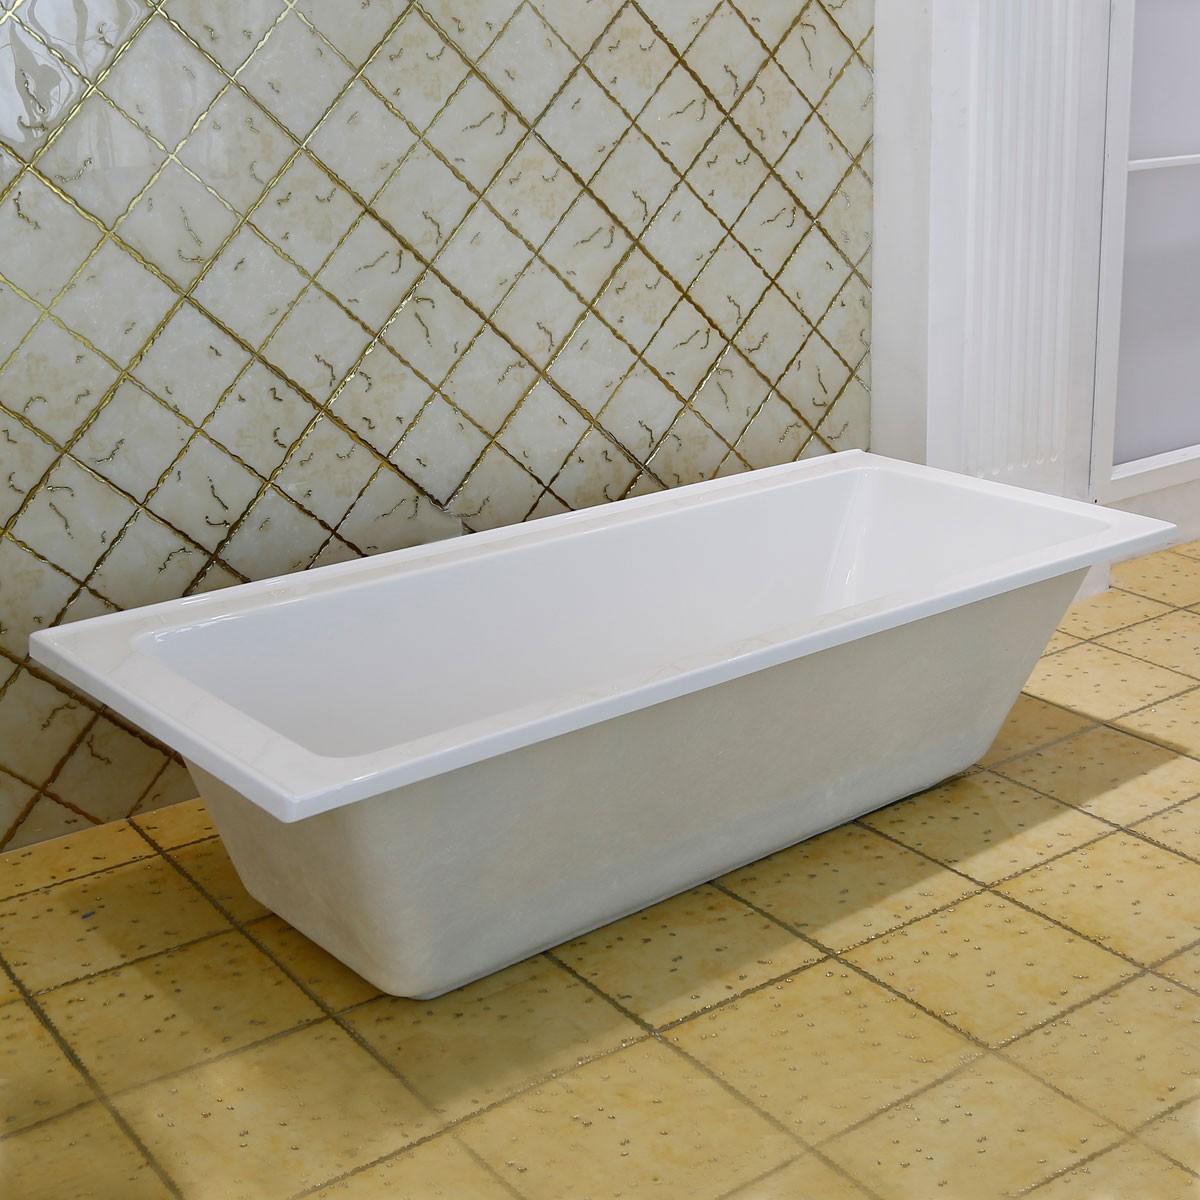 Fullsize Of Drop In Bathtub